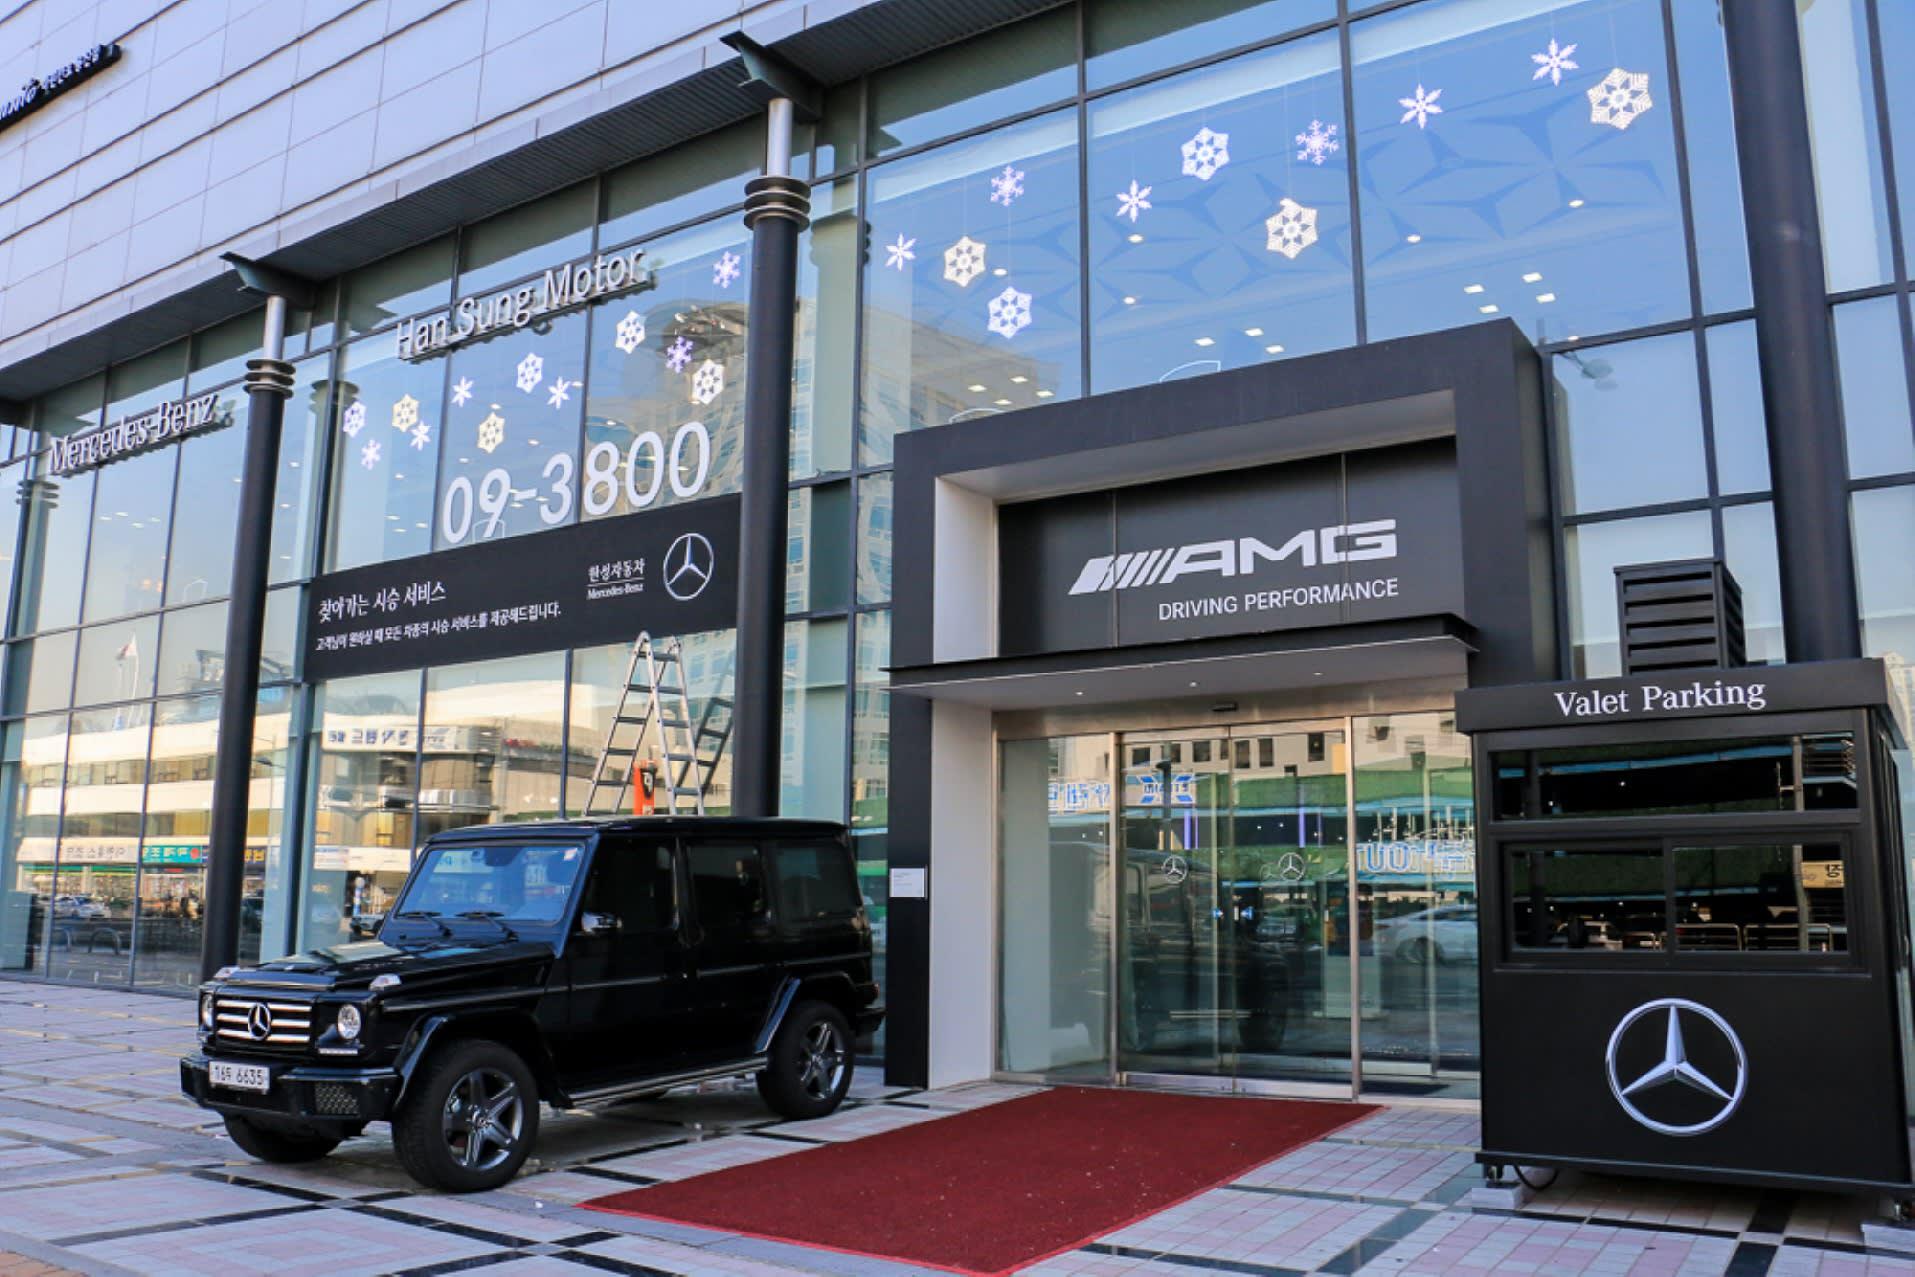 tablet san in dealership dealer mercedes ny car benz luxury boerne antonio welcome dealers near of serving